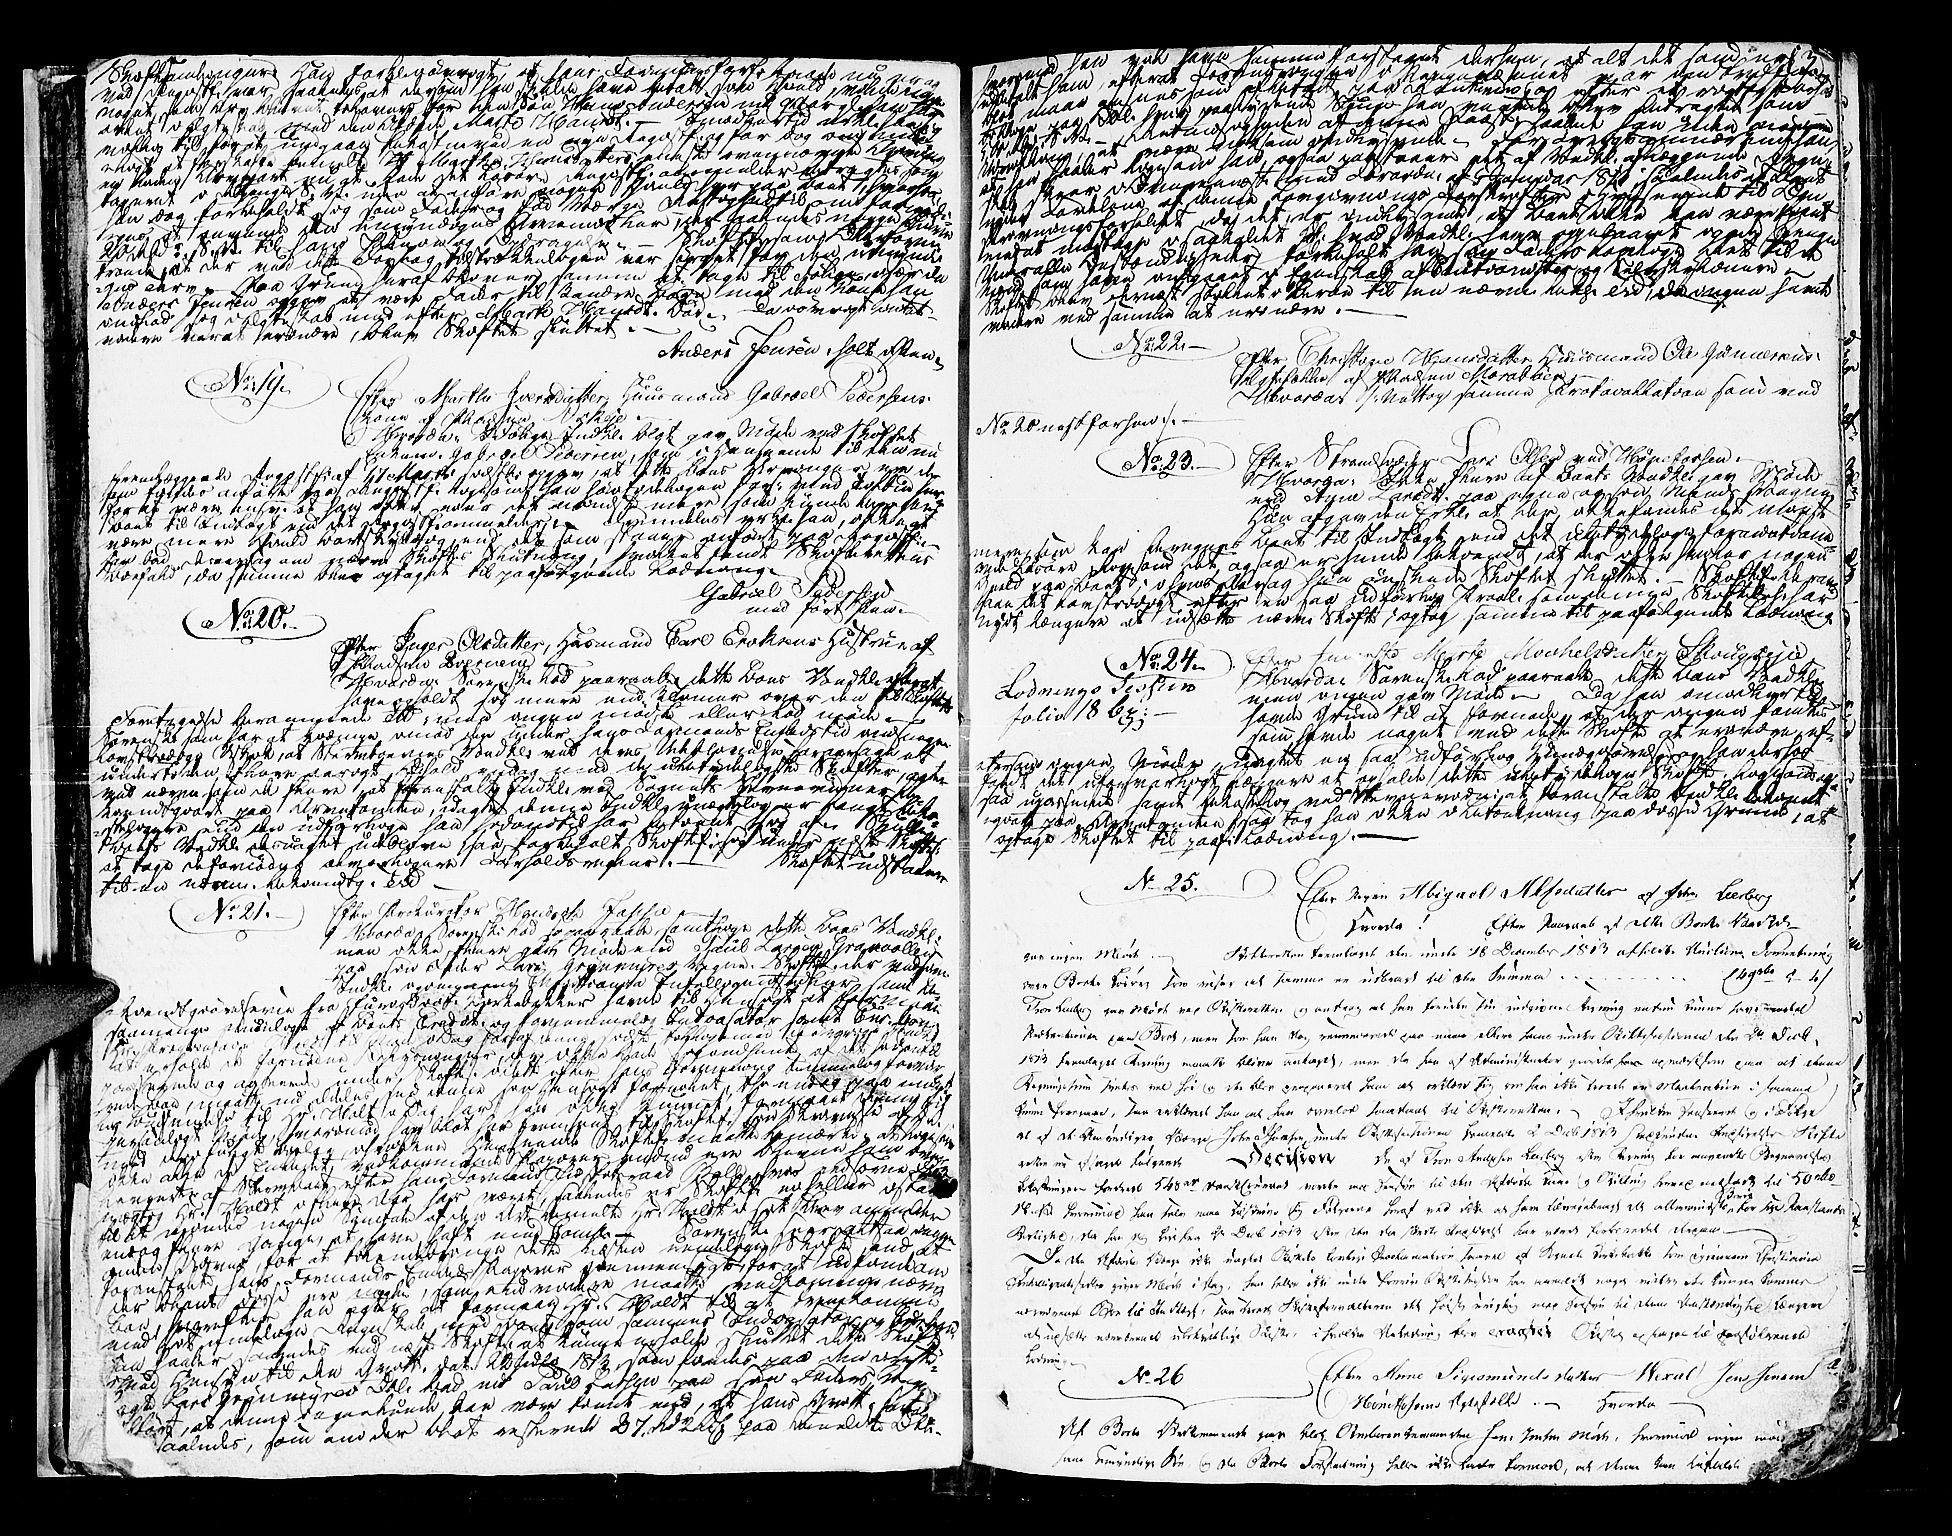 SAKO, Ringerike og Hallingdal sorenskriveri, H/Ha/L0025a: Skifteprotokoll, 1815-1822, s. 12b-13a